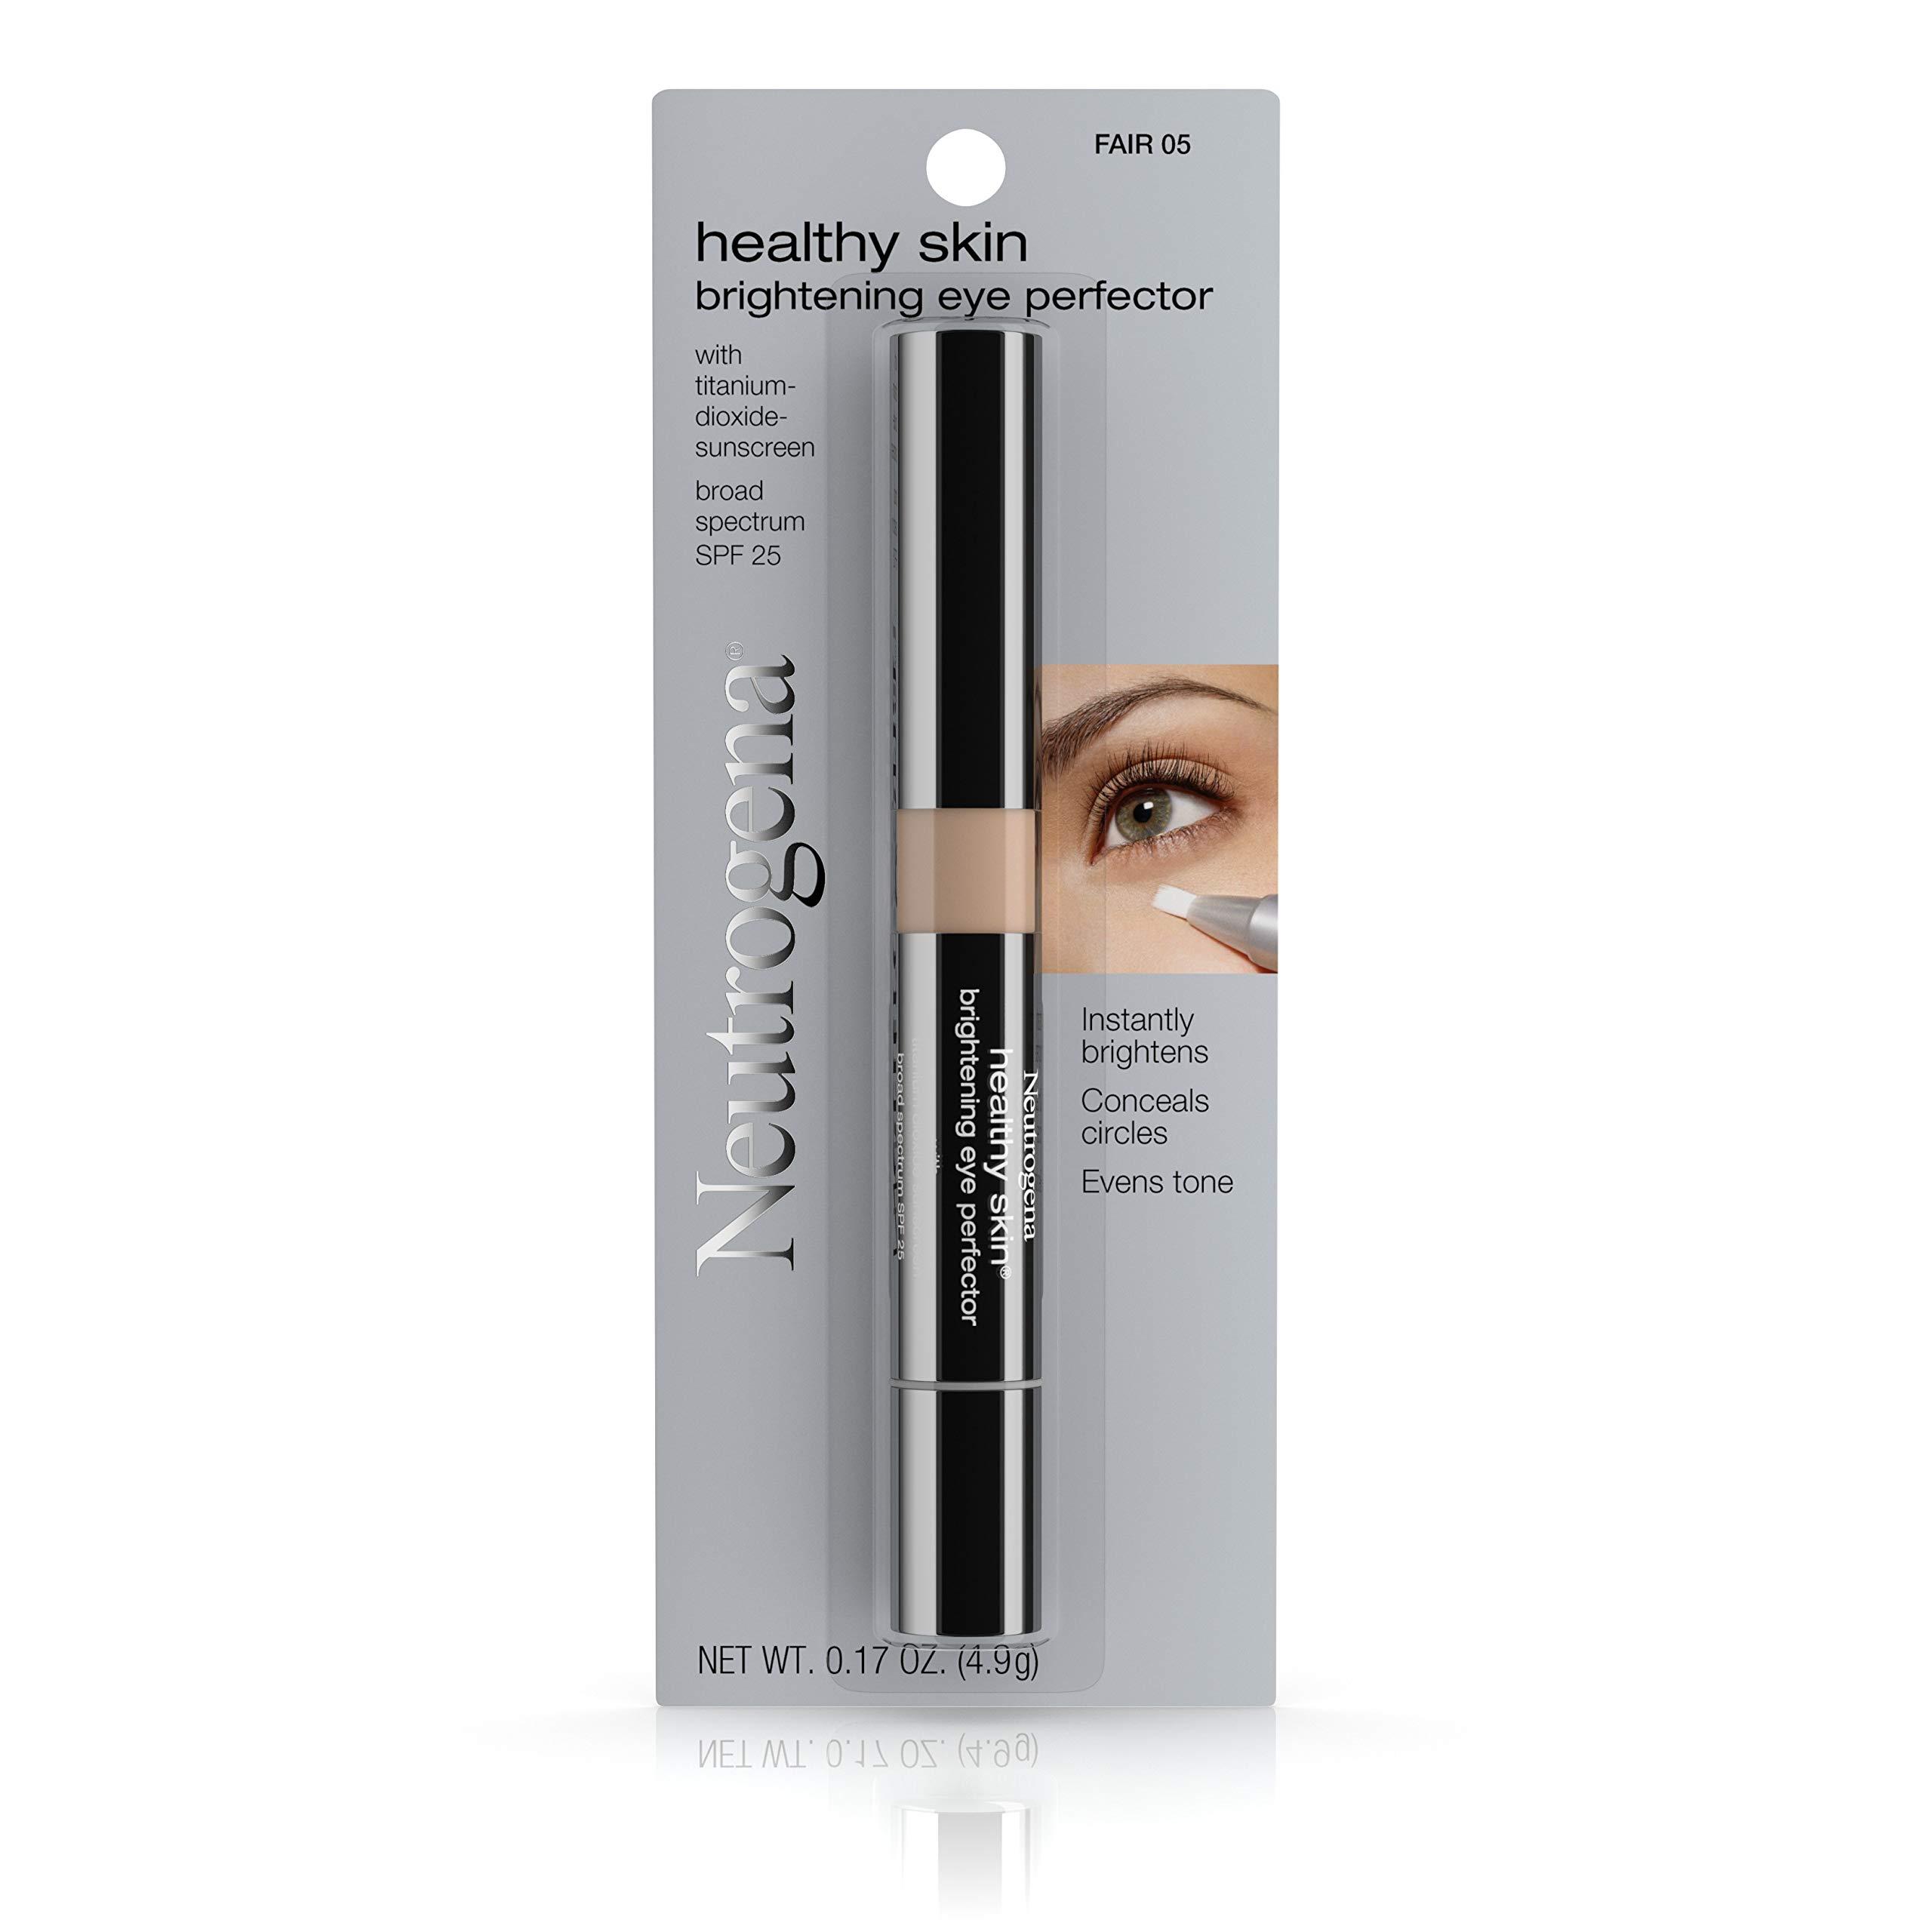 Neutrogena Healthy Skin Brightening Eye Perfector, SPF 25, Buff 09, 0.17 Ounce (Pack of 2) by Neutrogena